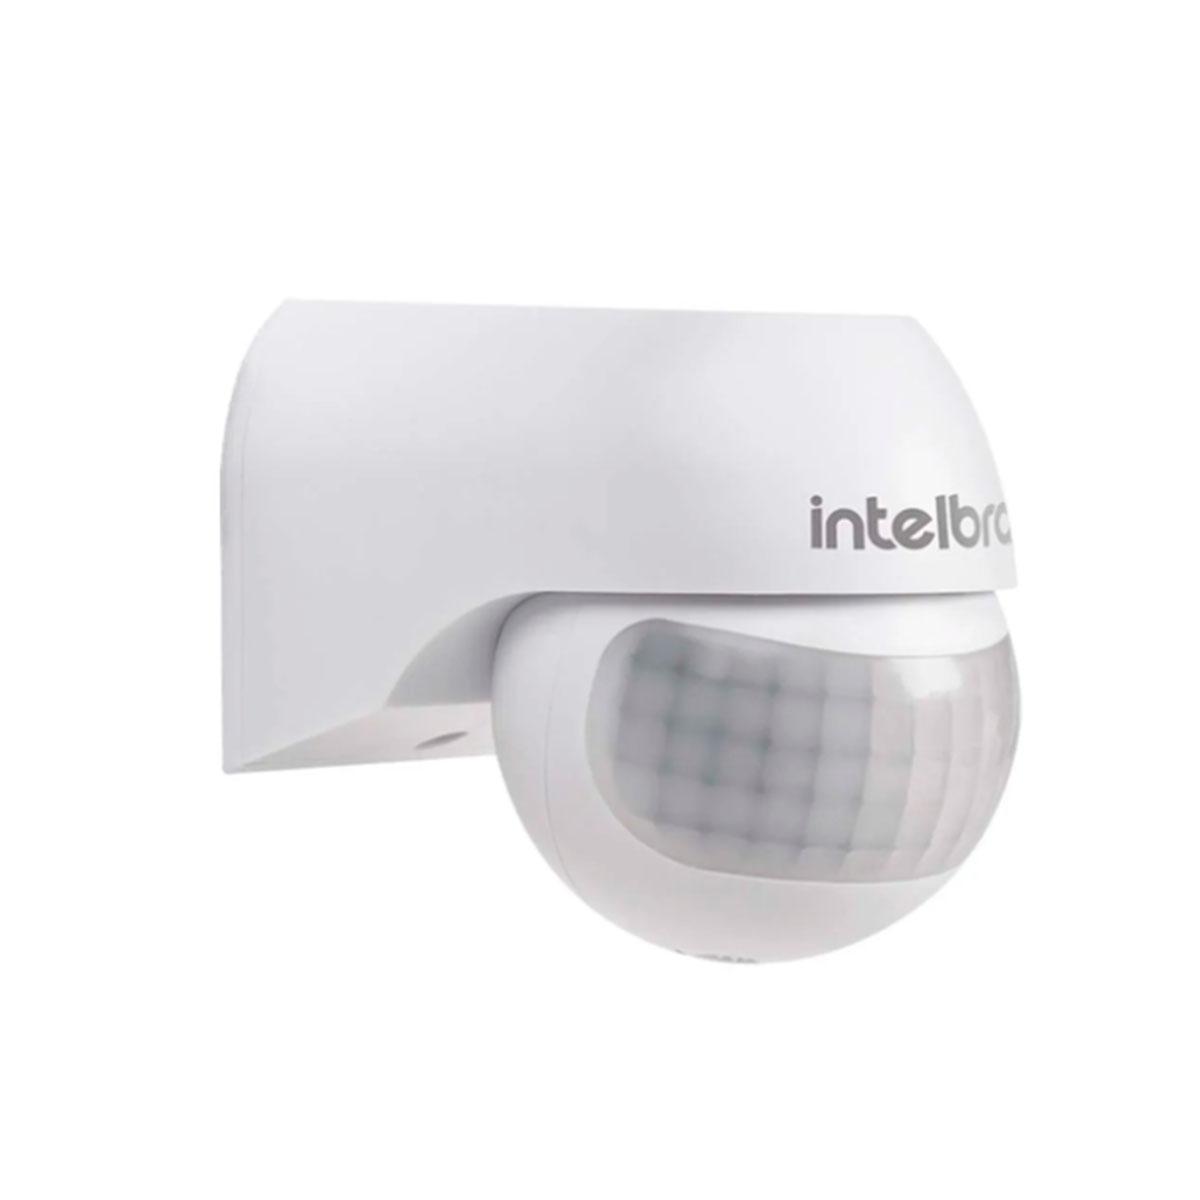 Kit 05 Sensor De Presença Intelbras Para Iluminação Esp 180